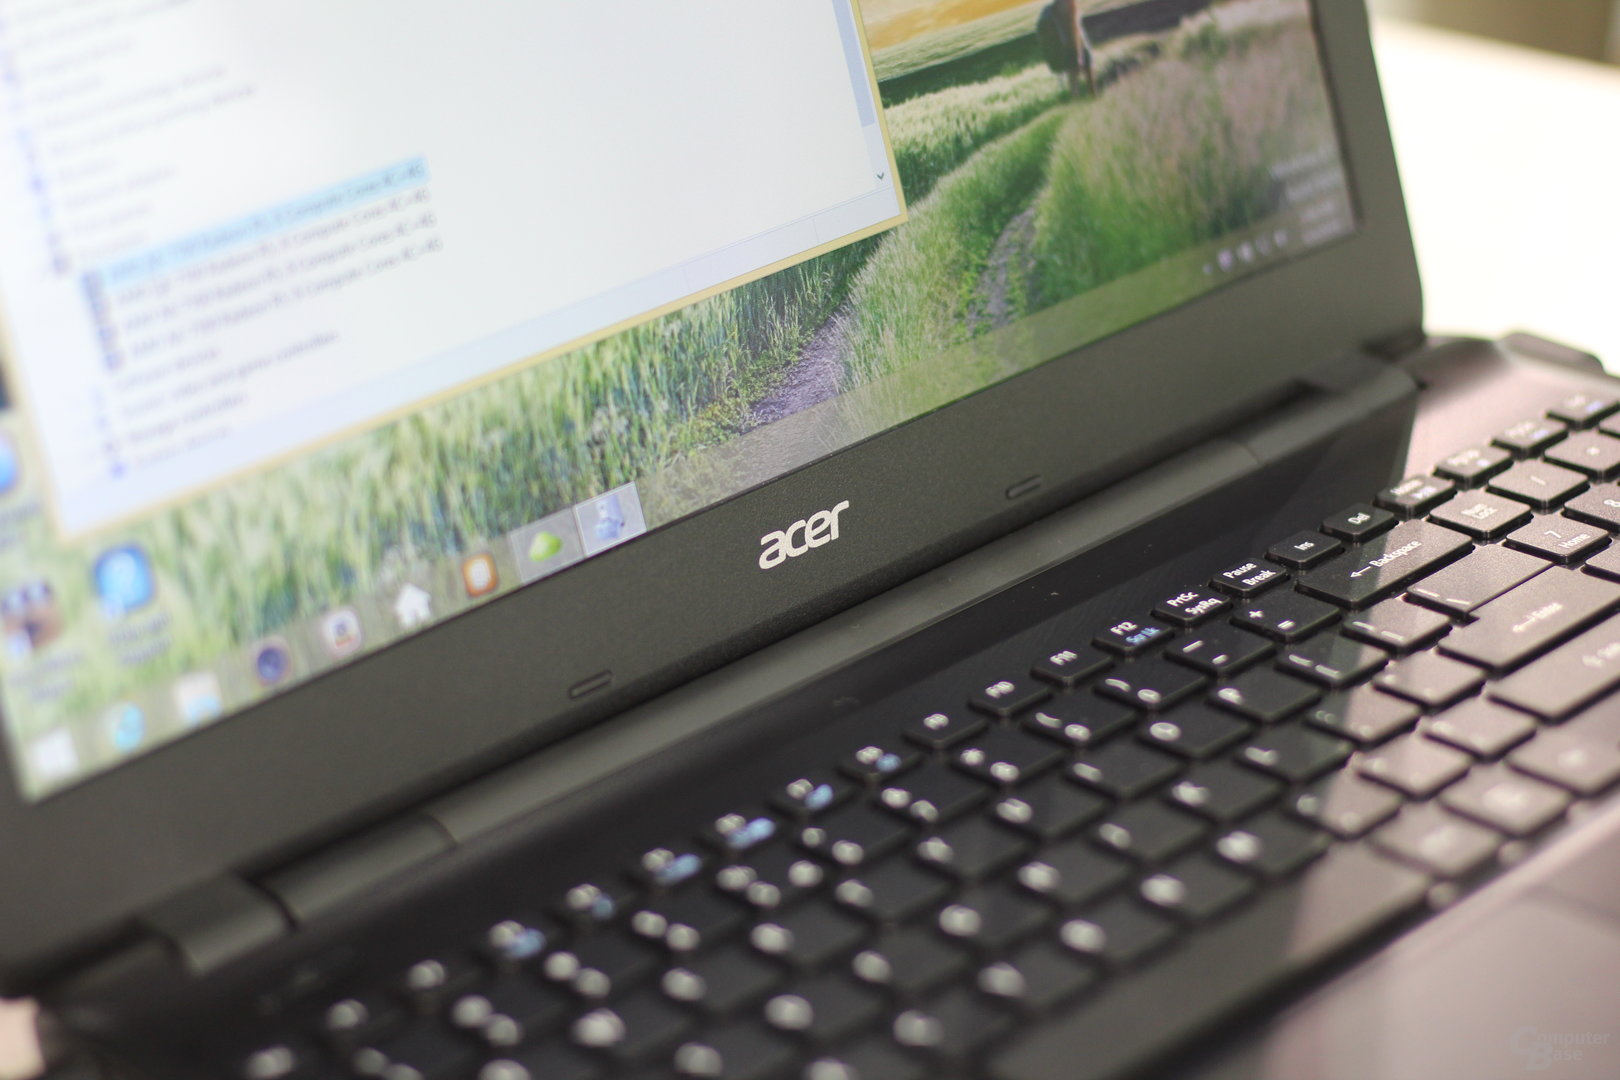 Acer Aspire E5 mit AMD Mobile Kaveri und 15 Zoll